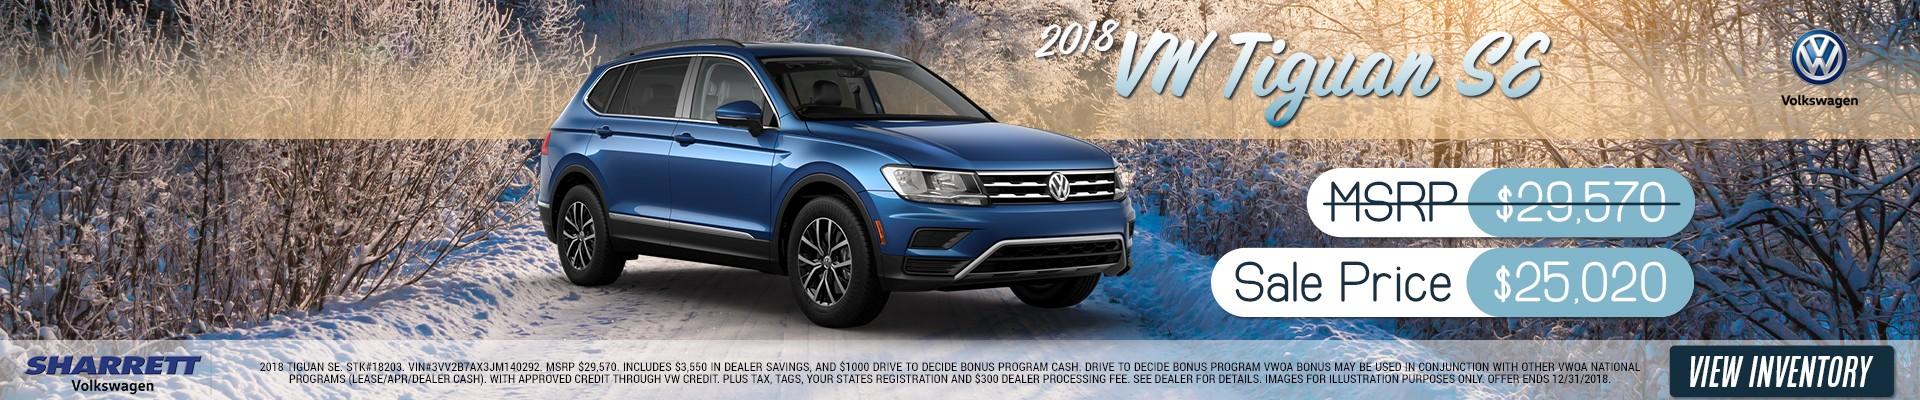 2018 VW Tiguan for $25,020